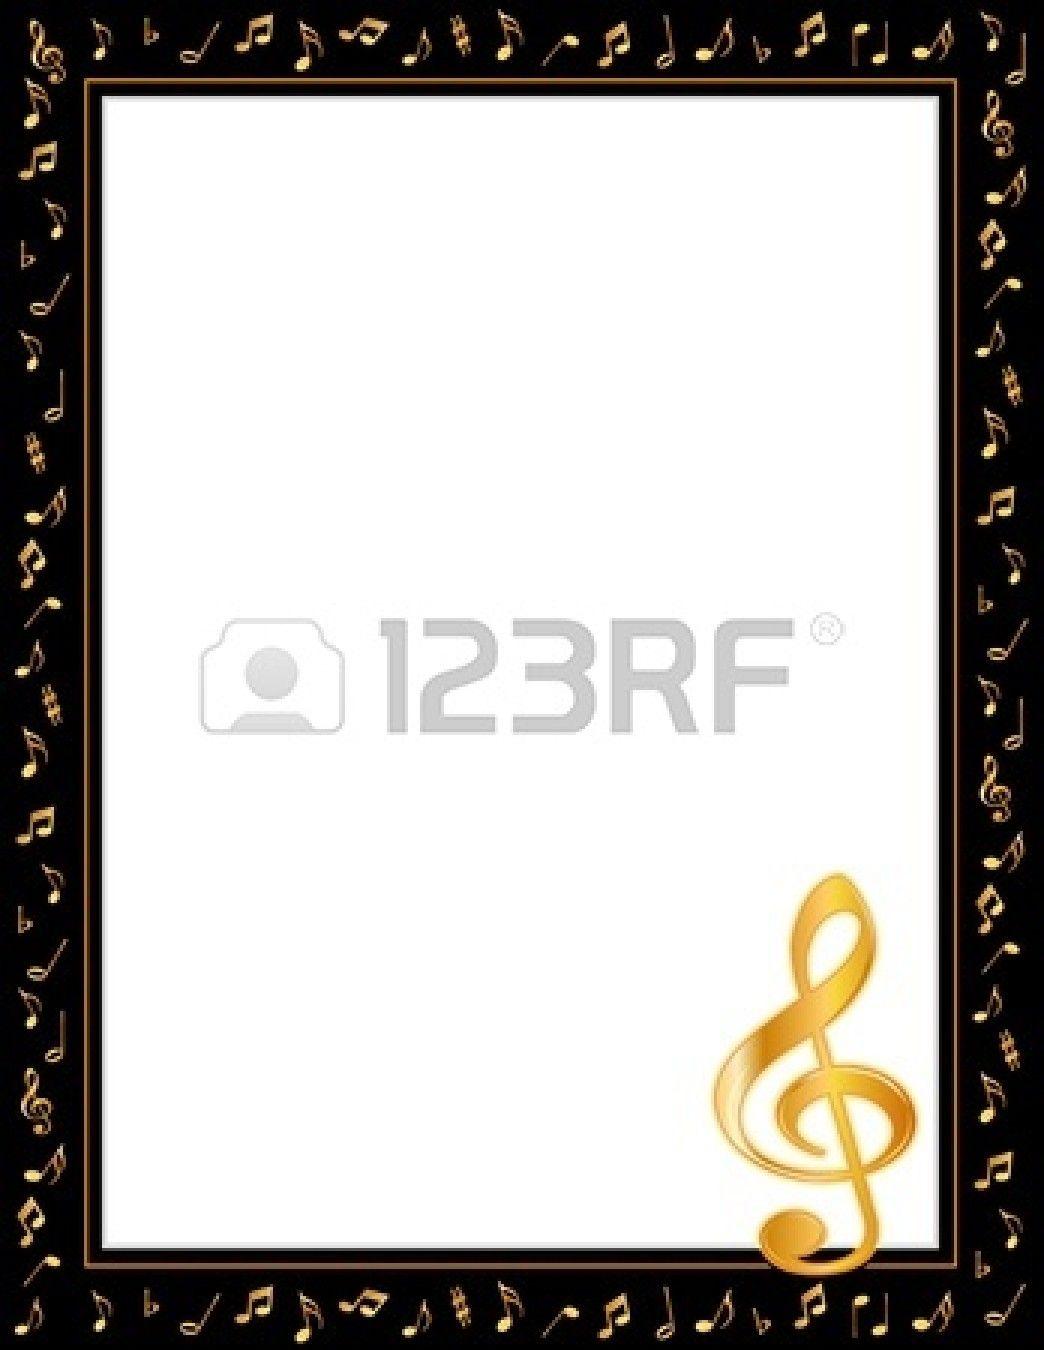 Music Entertainment Poster Frame, schwarzer Rand, Gold Noten ...